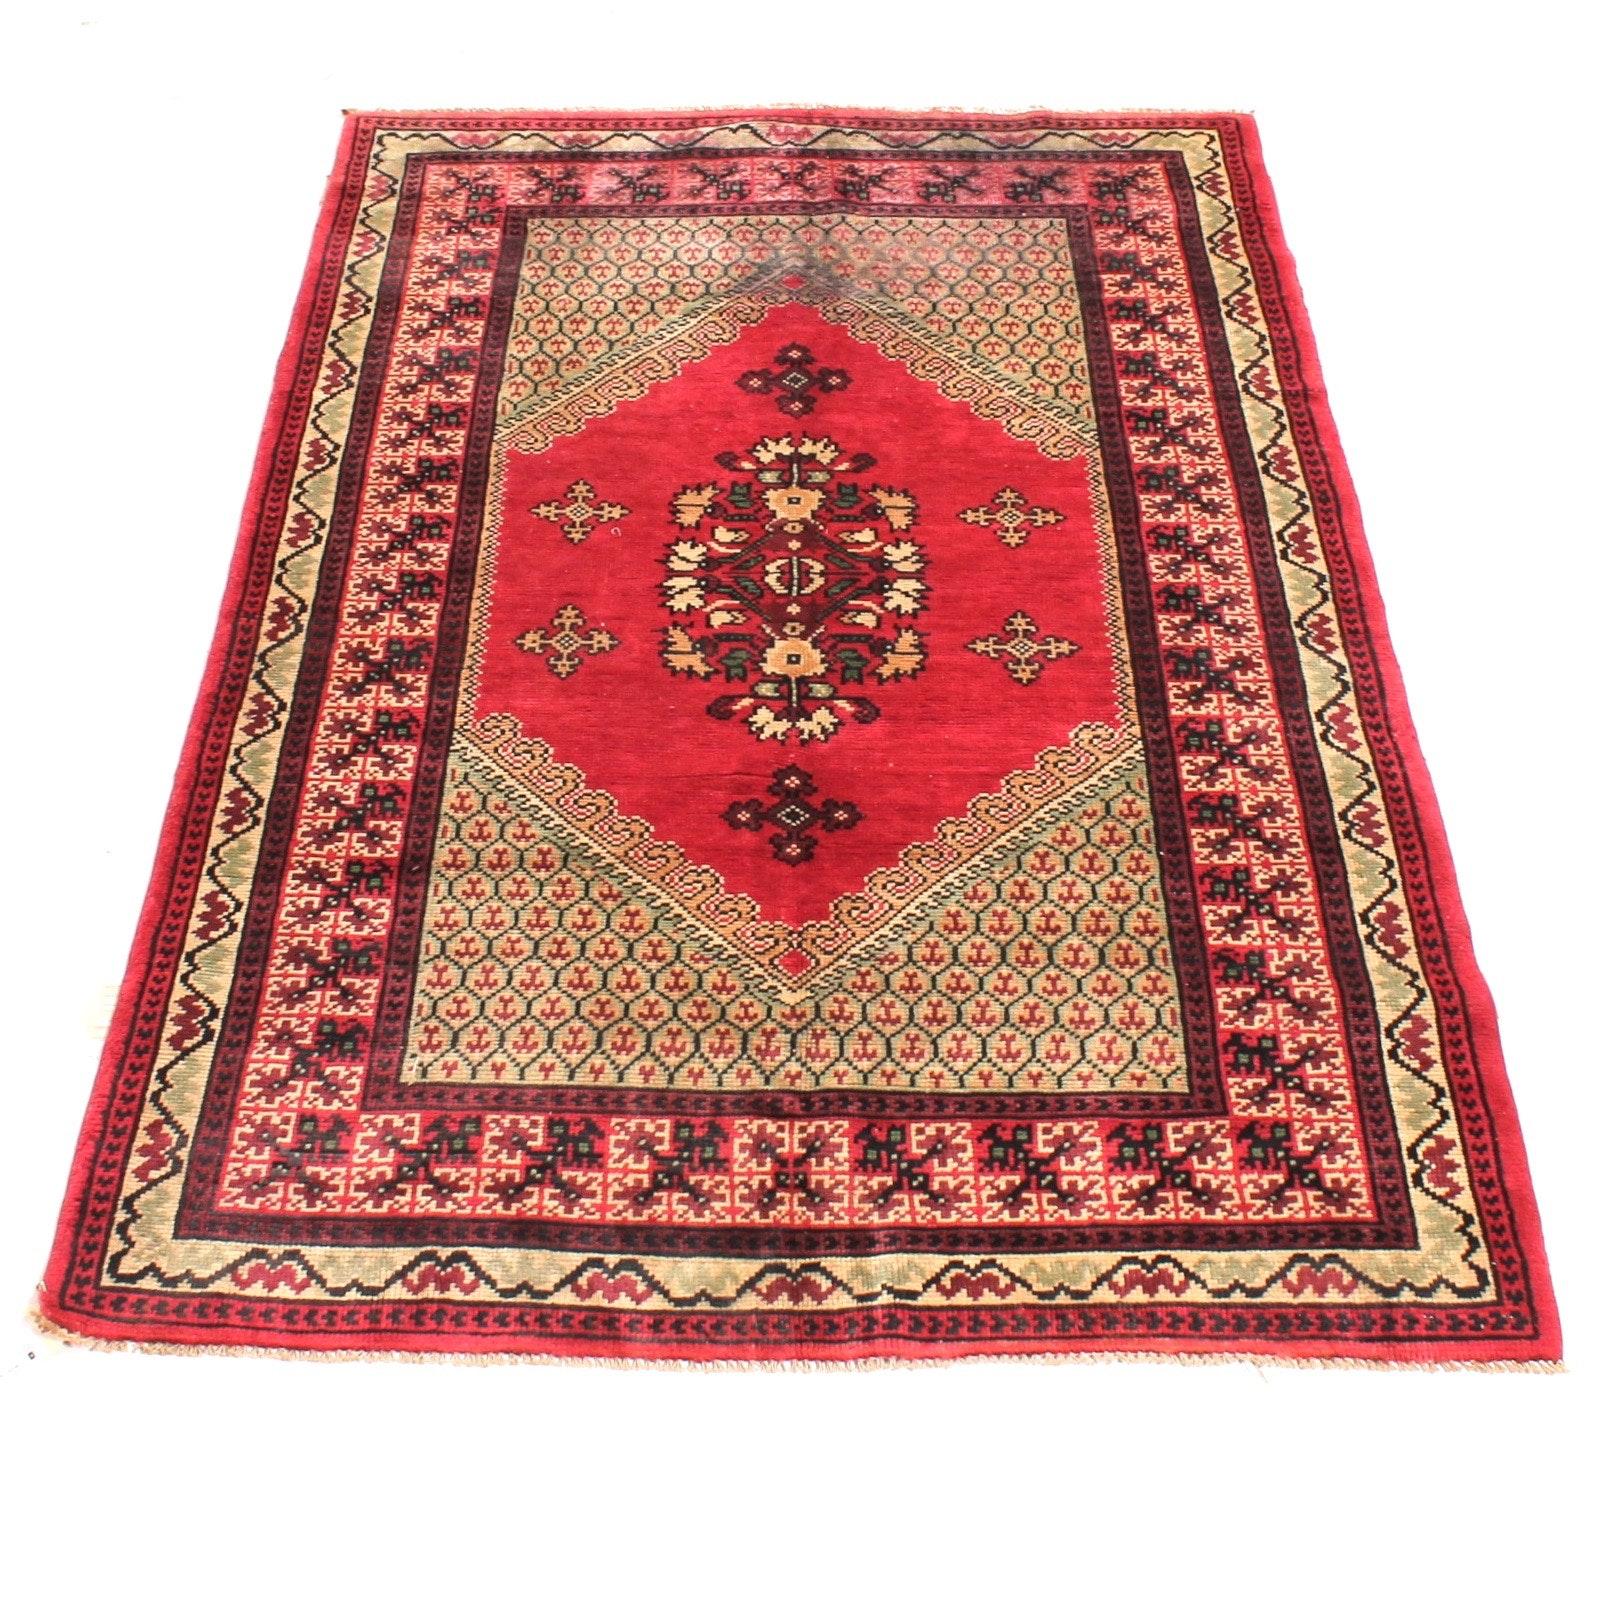 Vintage Hand-Knotted Persian Seneh Bijar Rug